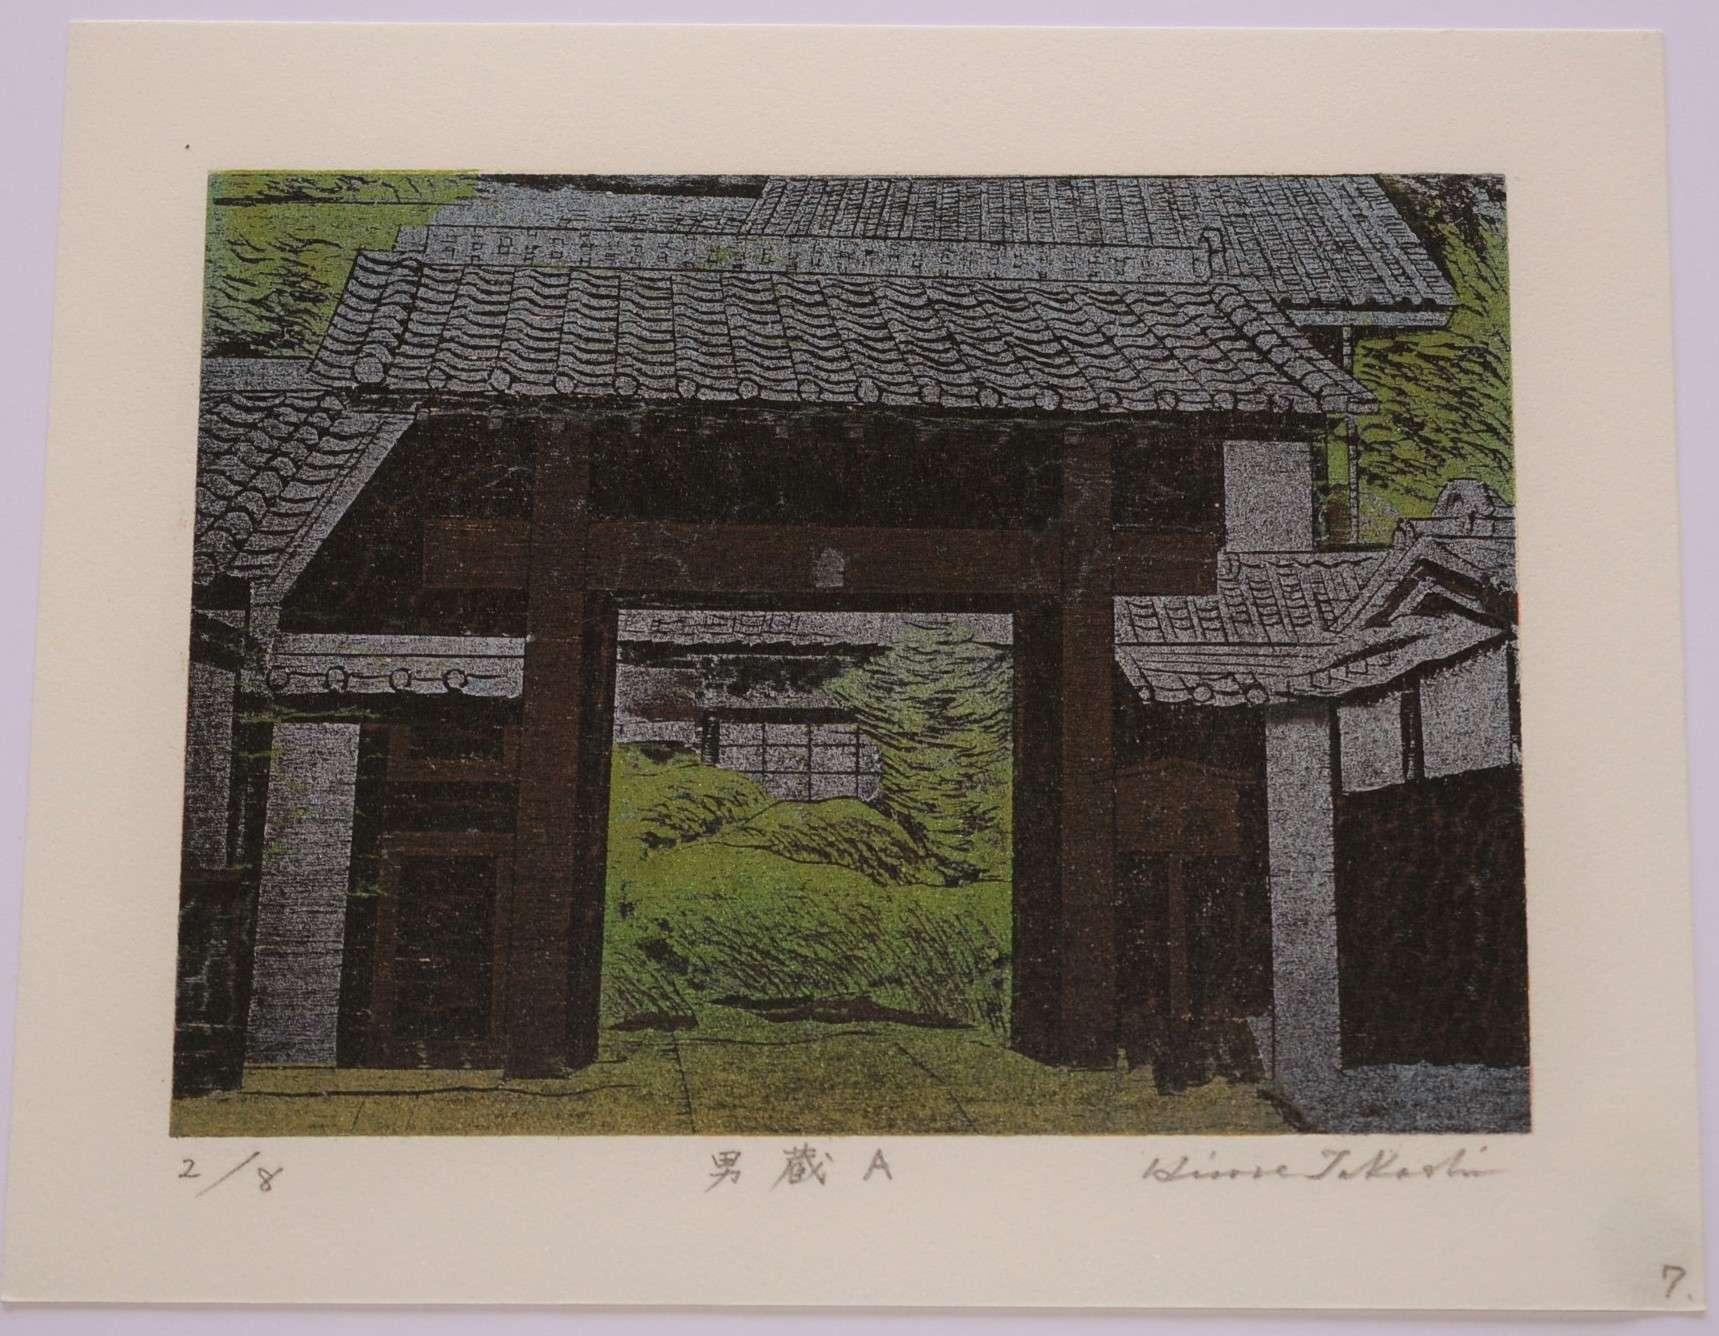 Takashi Hirose: #P4515 OTOKO GURA - STORE HOUSE